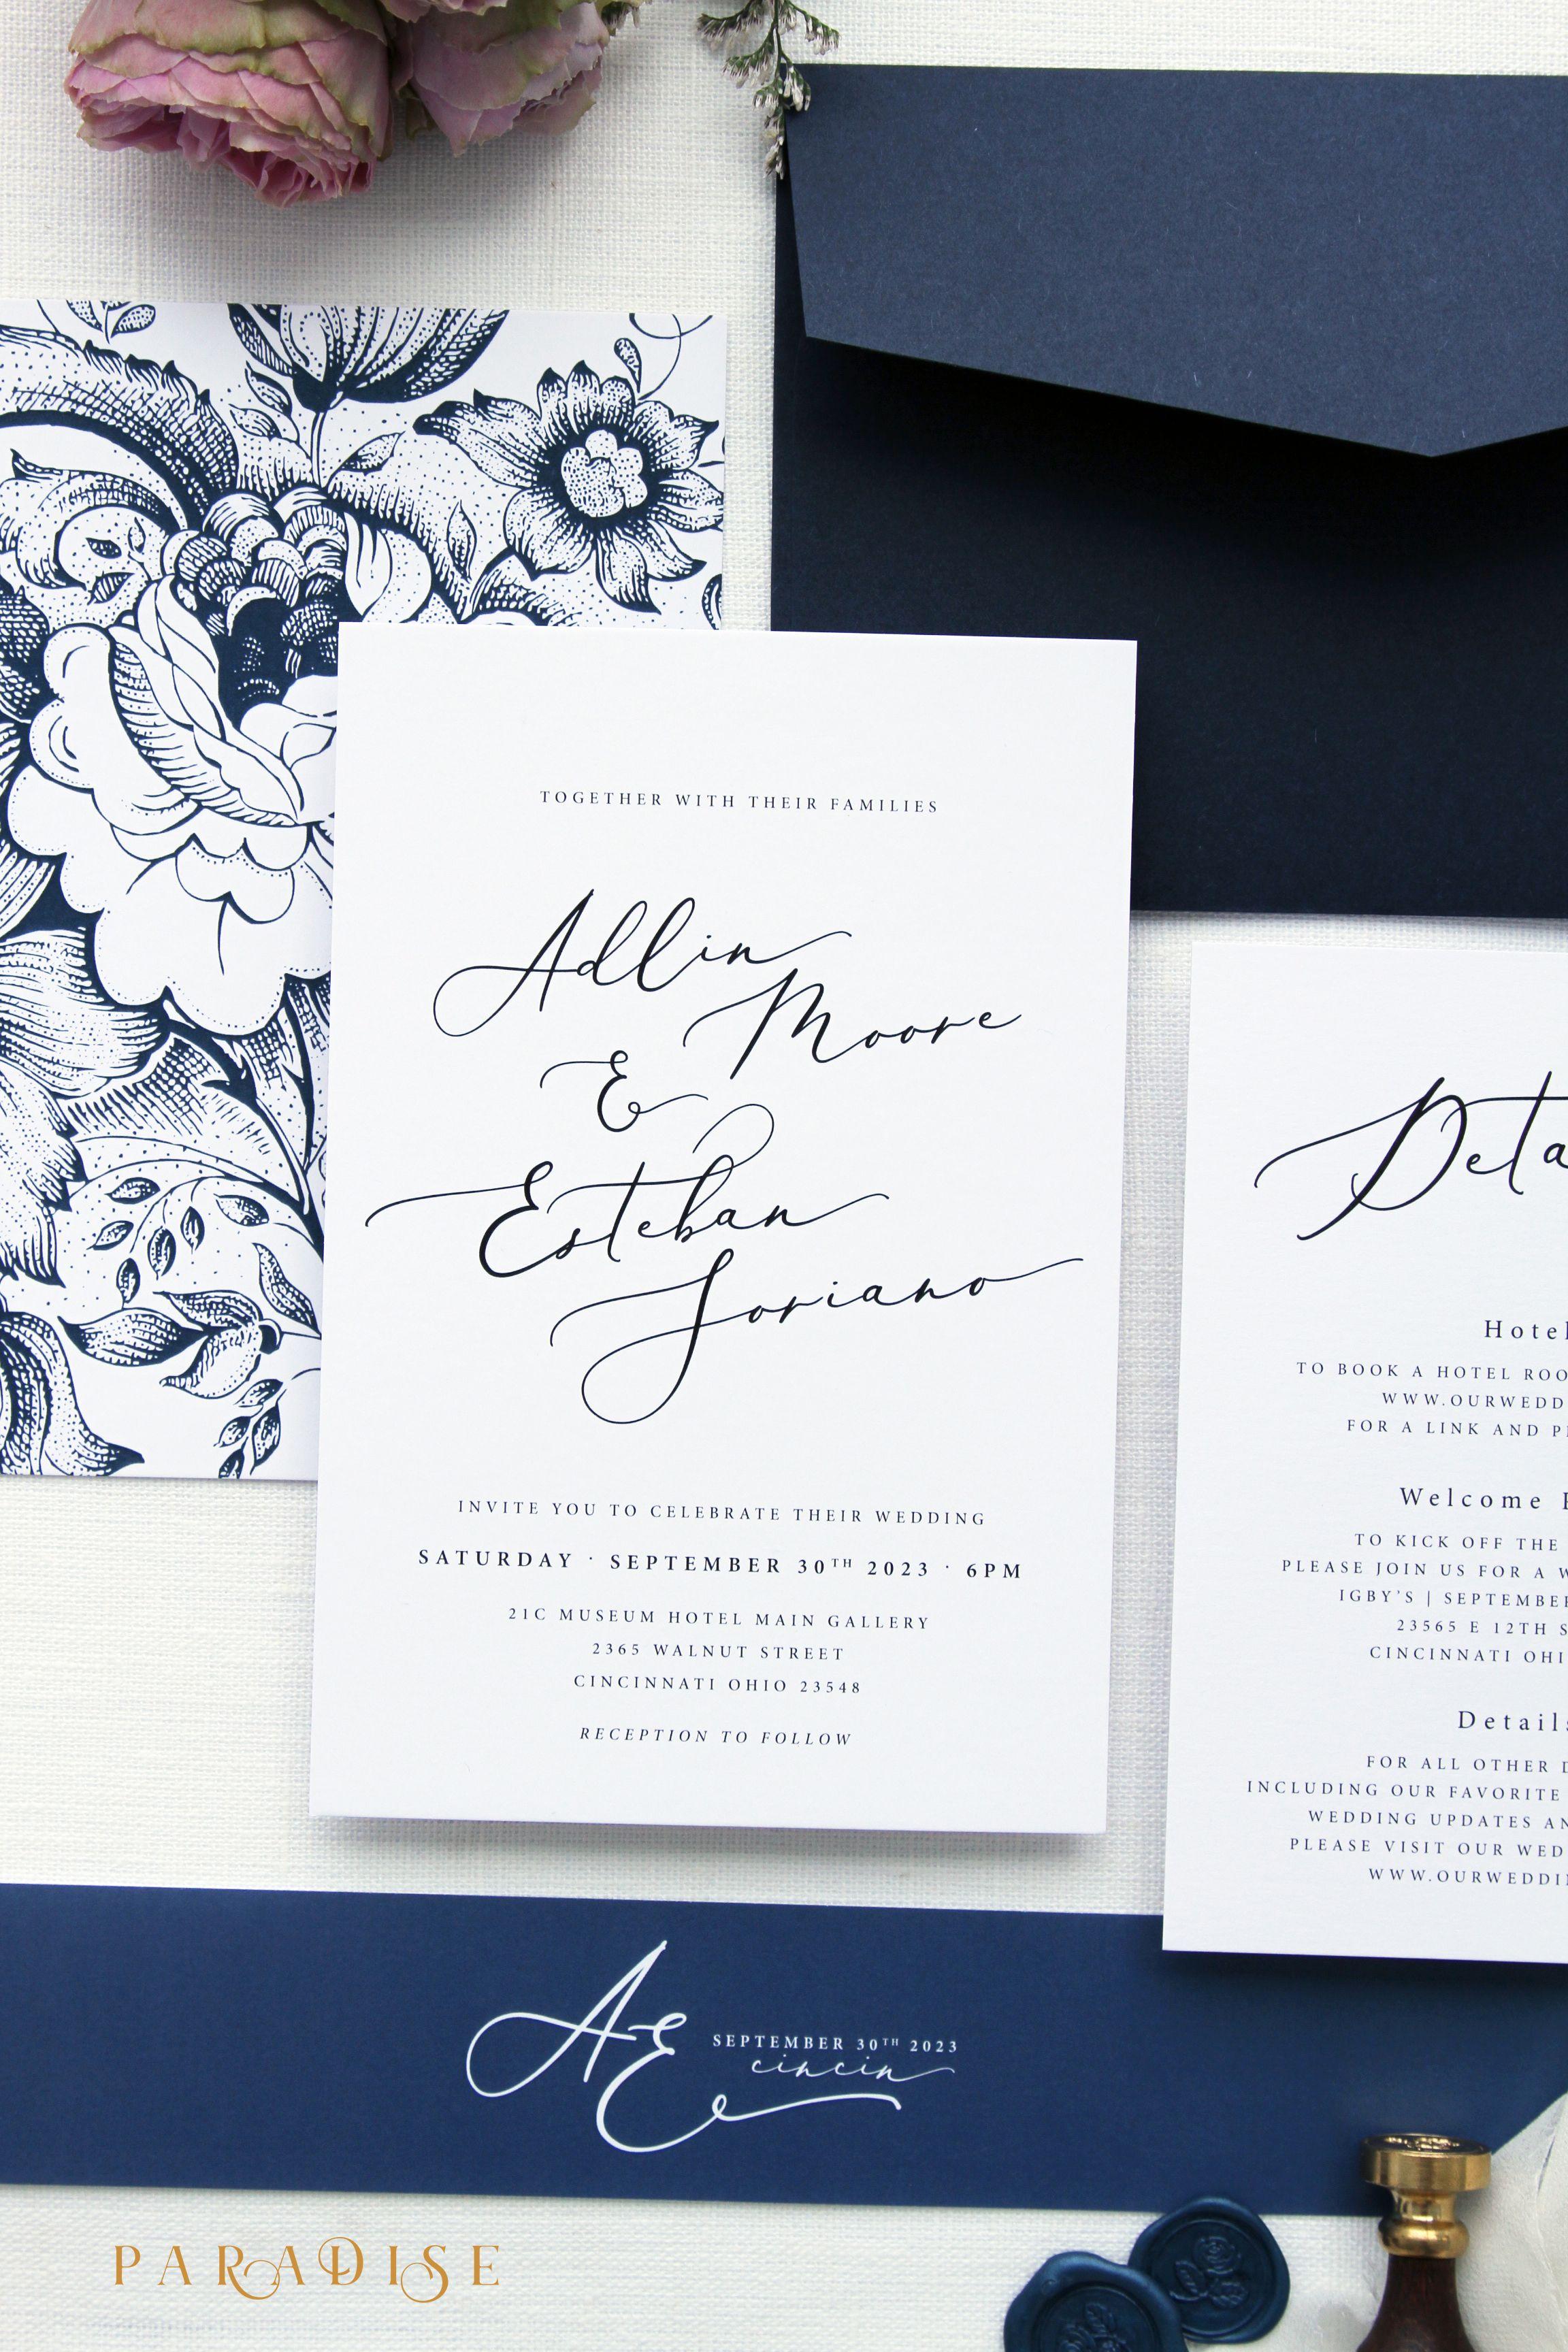 Adlin Elegant Wedding Invitation Sets Modern Kits Stationery Navy Wax Seals Calligraphy Invitations